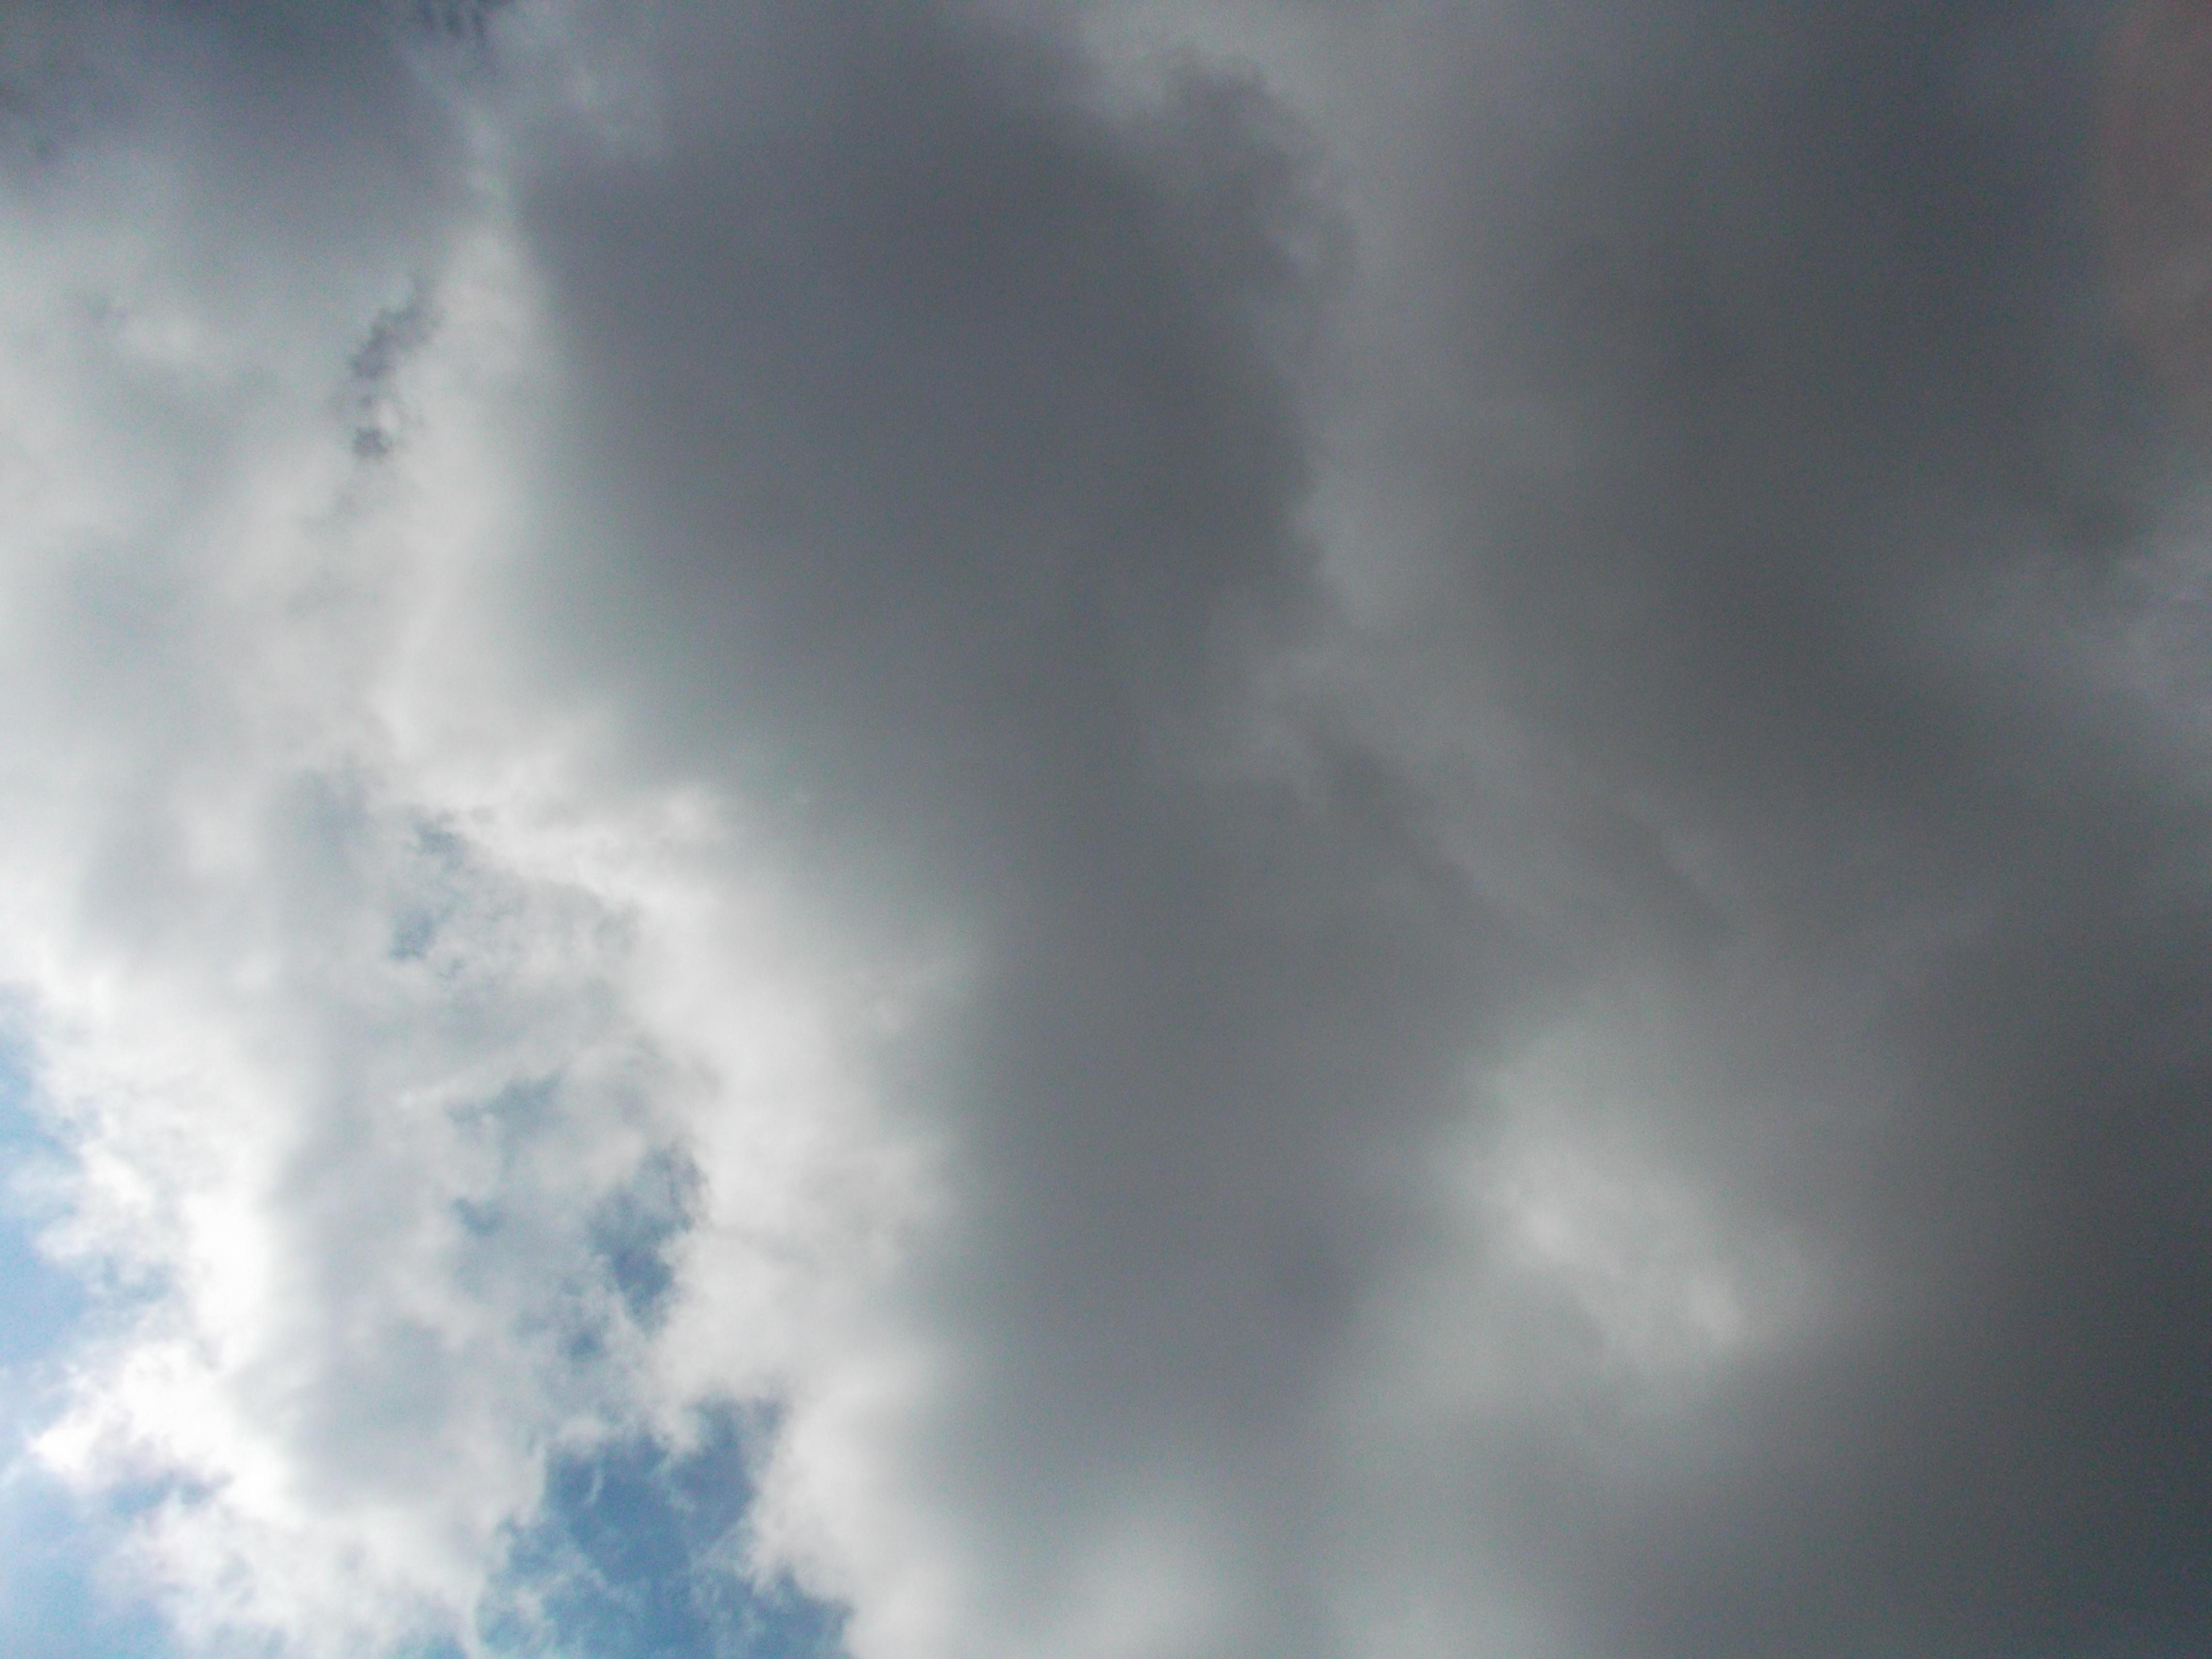 2013-03-20 Longitude -0.360578 Latitude 49.168919 Altitude 29 Heure 14h34